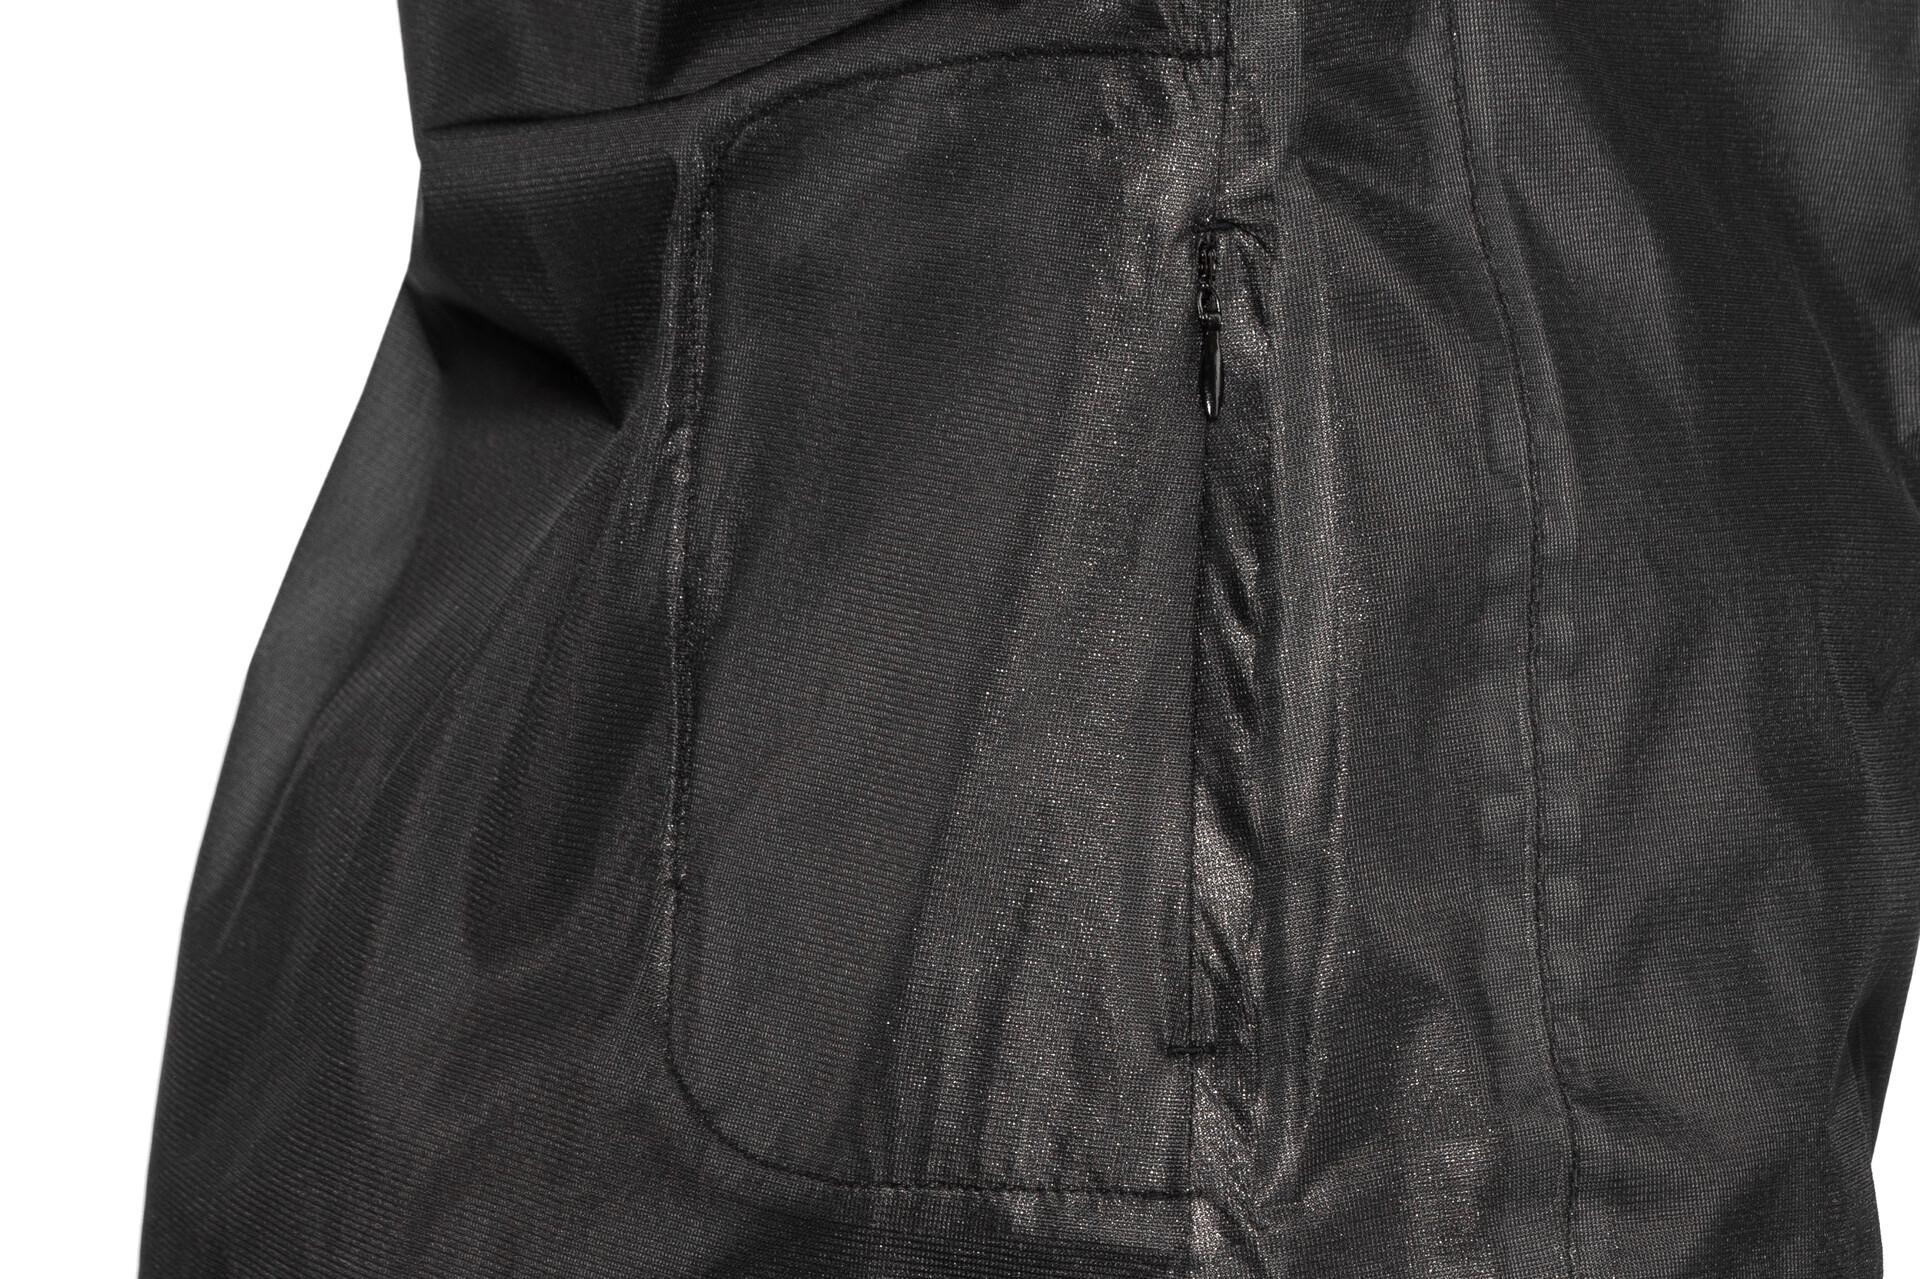 2xu Packable FemmeBlackblack 2xu FemmeBlackblack Packable Veste Veste Veste FemmeBlackblack Packable 2xu OZTPiwkXu